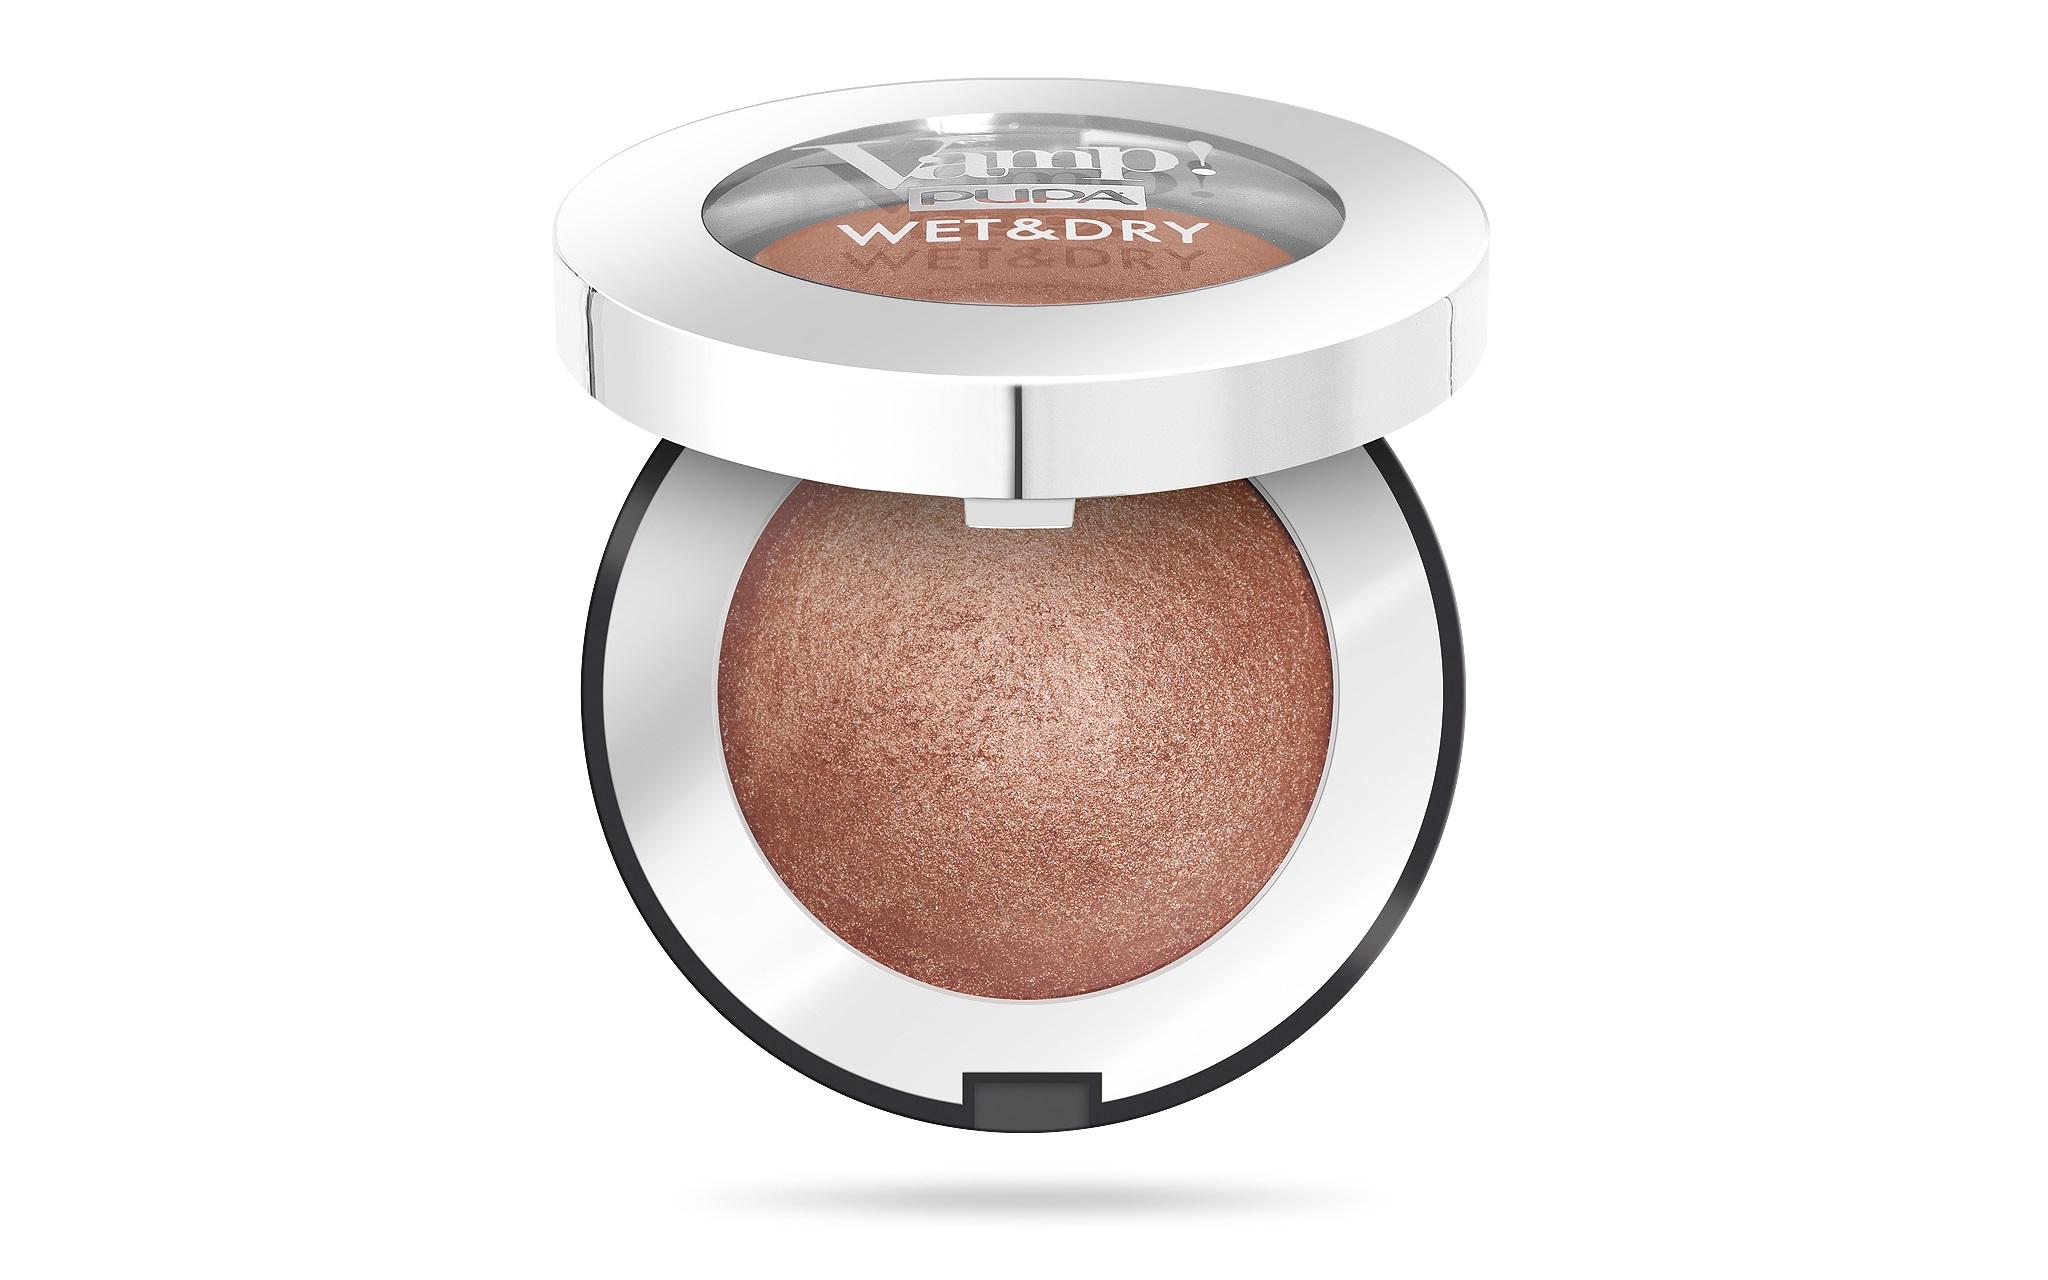 Pupa Vamp Wet&Dry Запеченные тени с сияющим финишем тон 104 Hot Copper